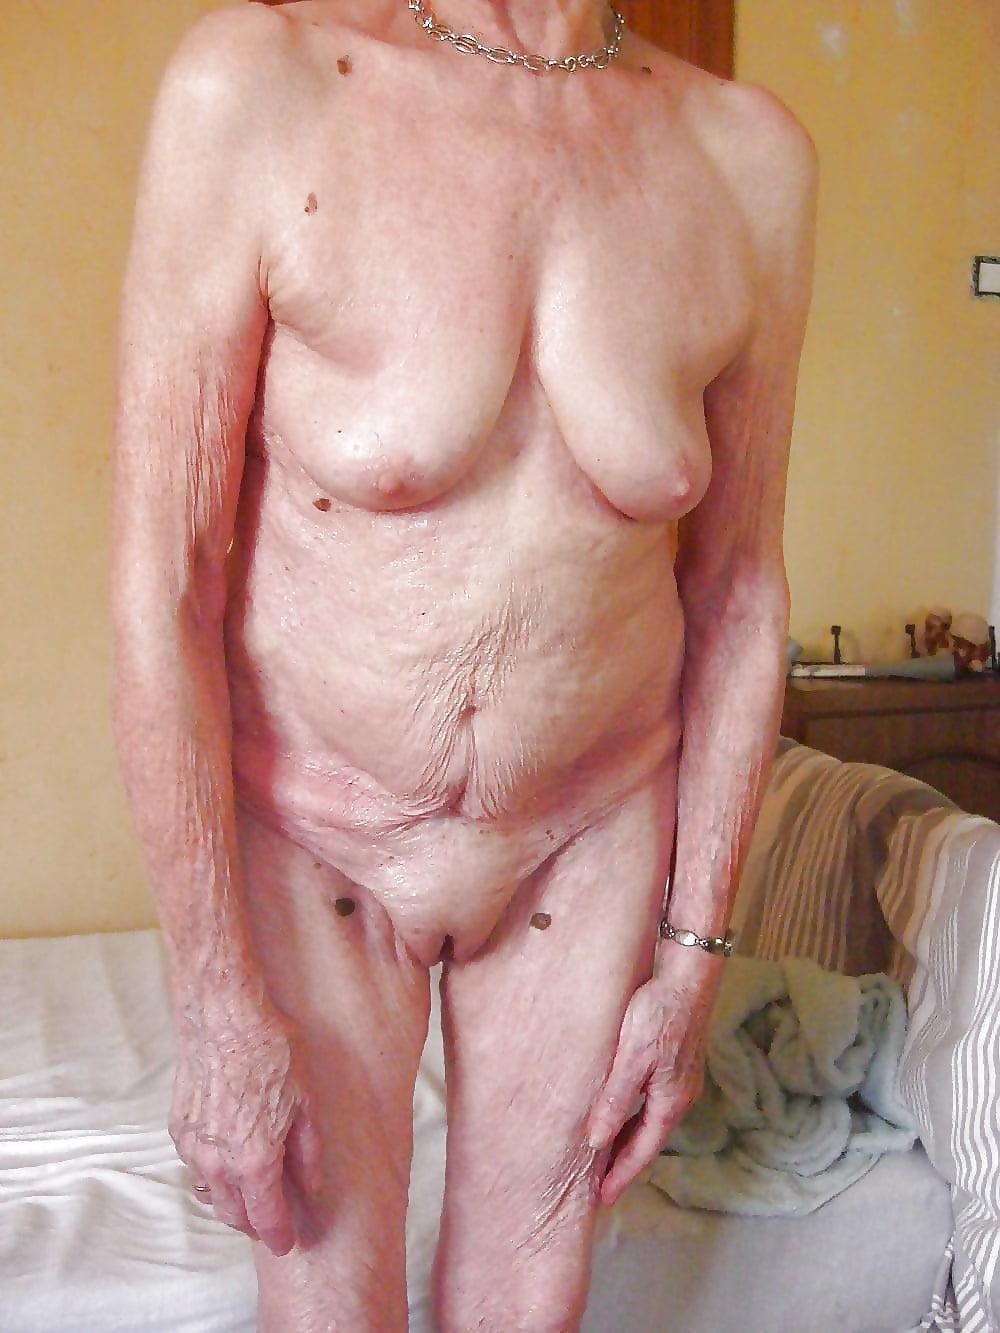 Slim old grandma nude, boracay babes nude